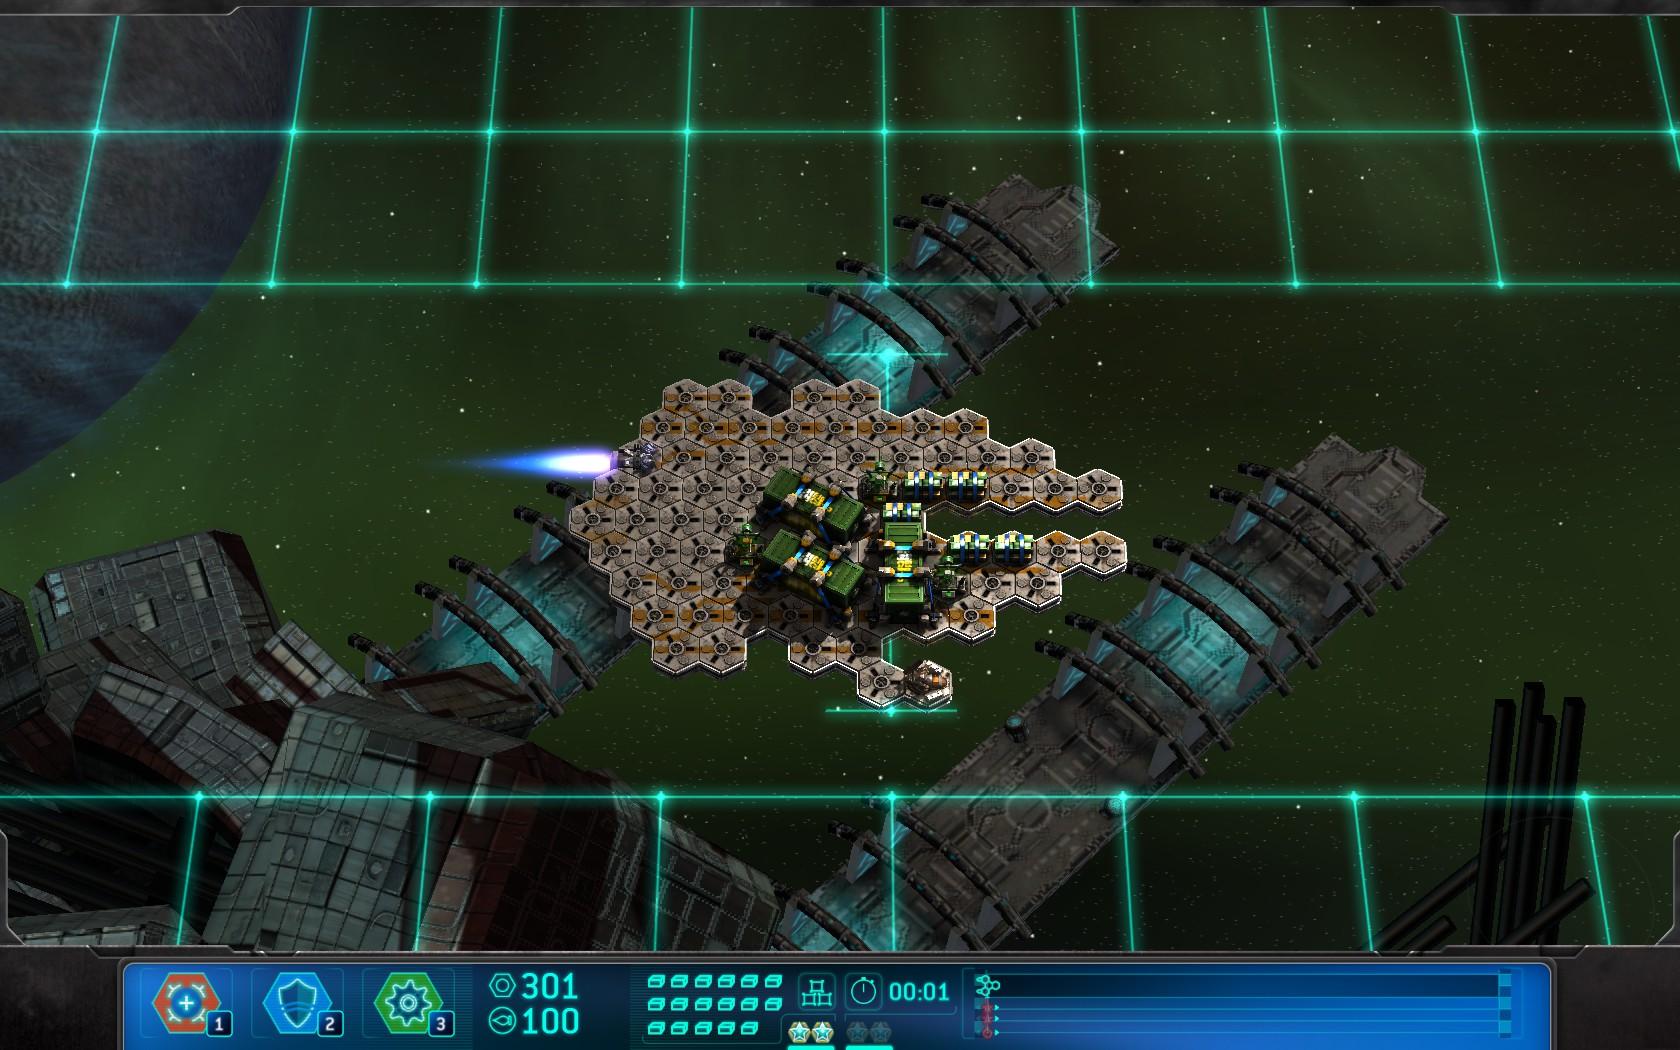 Space Run Millennium Falcom